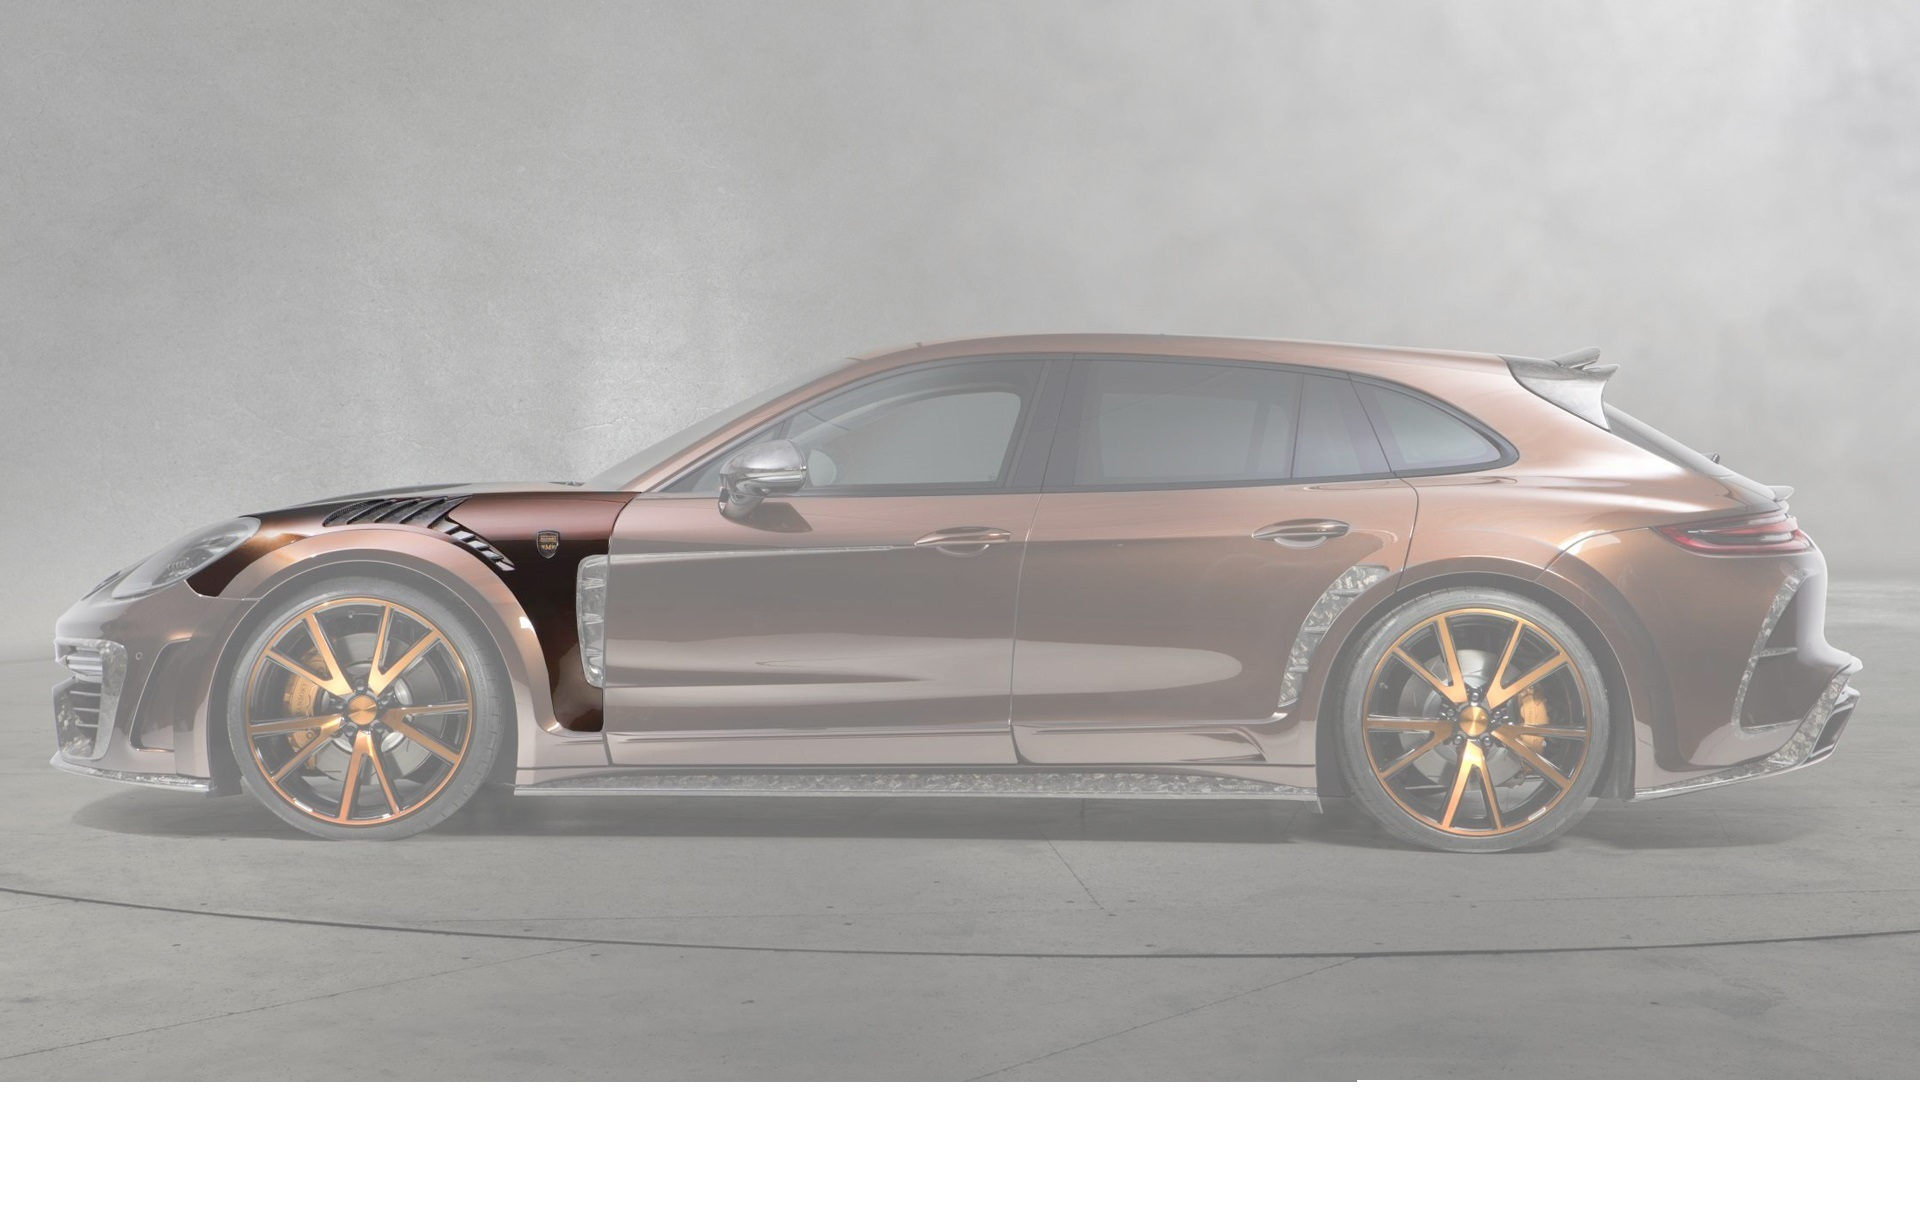 Hodoor Performance Carbon fiber front fenders Mansory Style for Porsche Panamera